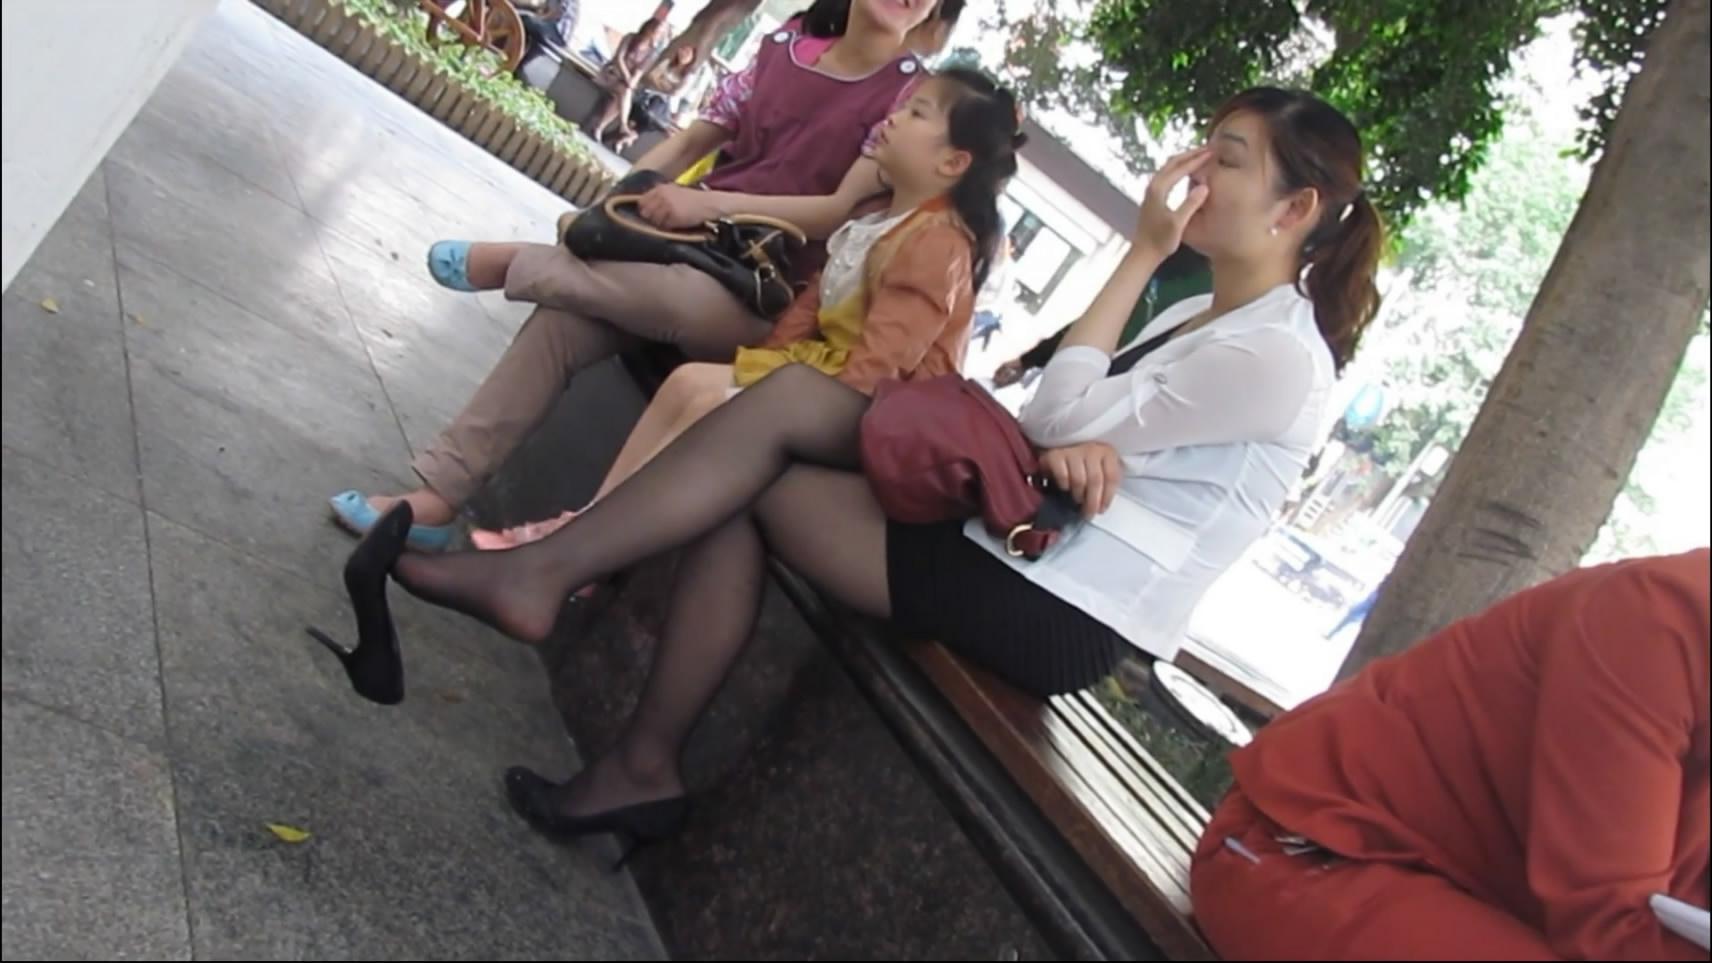 Lesbian Feet Socks Nylon